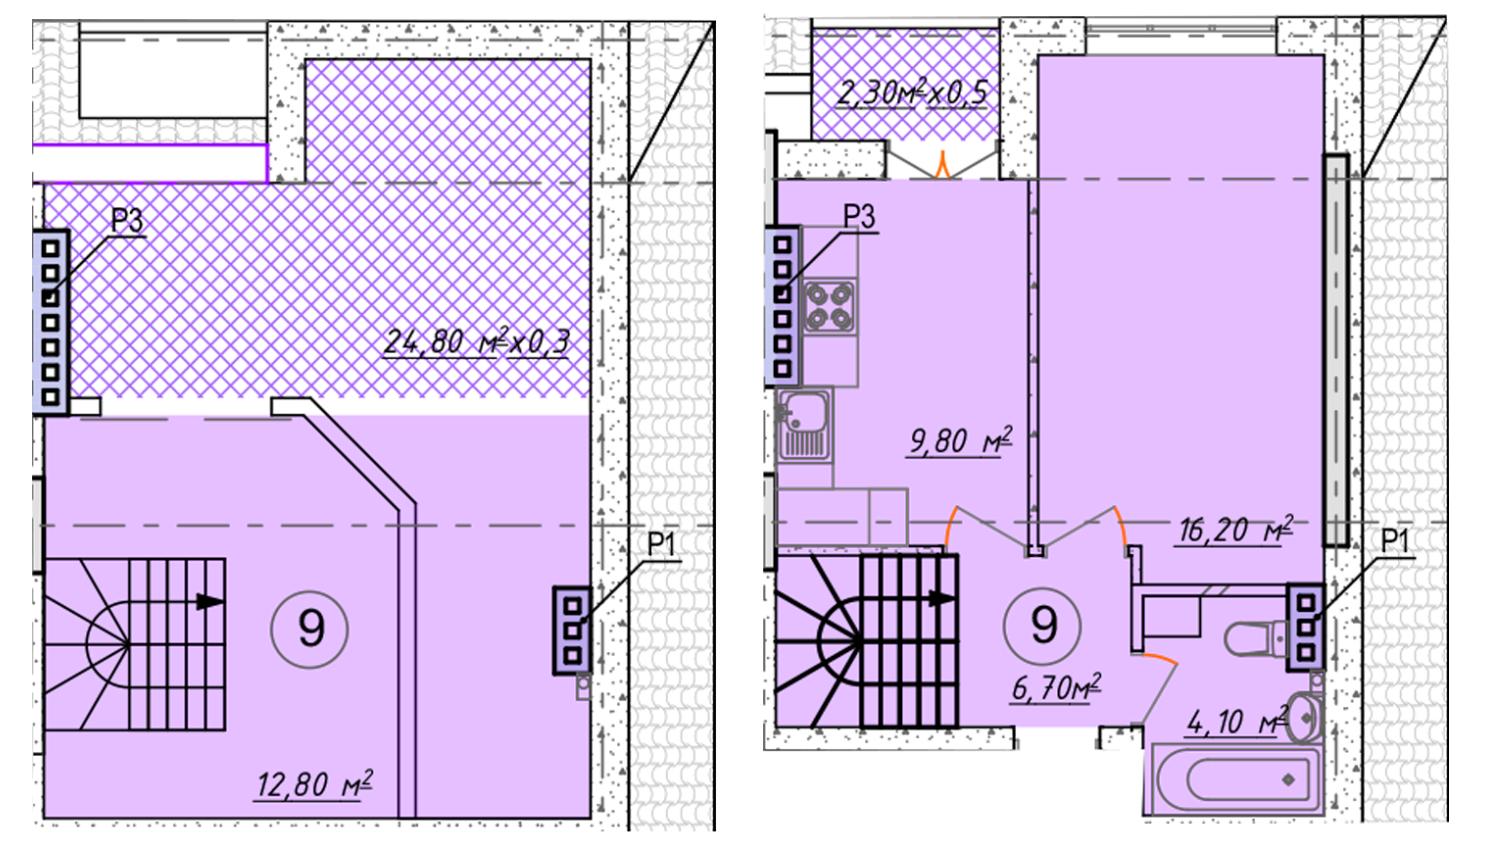 Однокомнатная - ЖК Club Marine 2 (Клаб Марин 2)ПроданаПлощадь:58,1m²